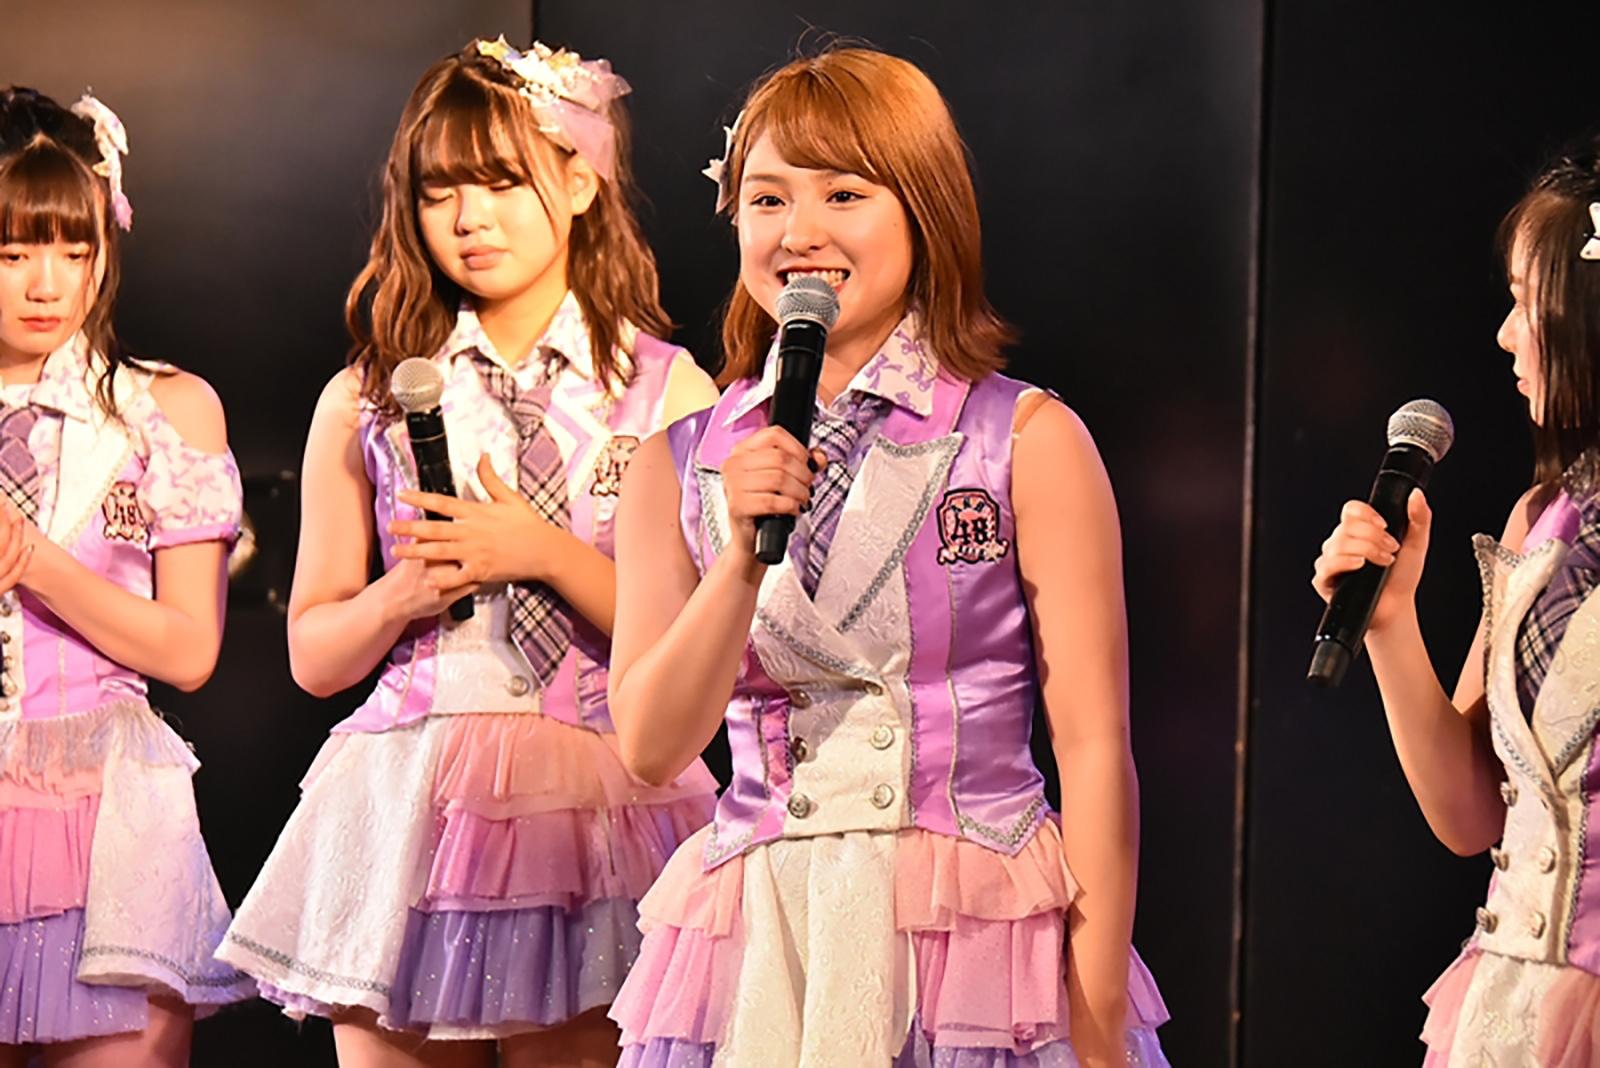 AKB48劇場で卒業発表をする山田菜々美